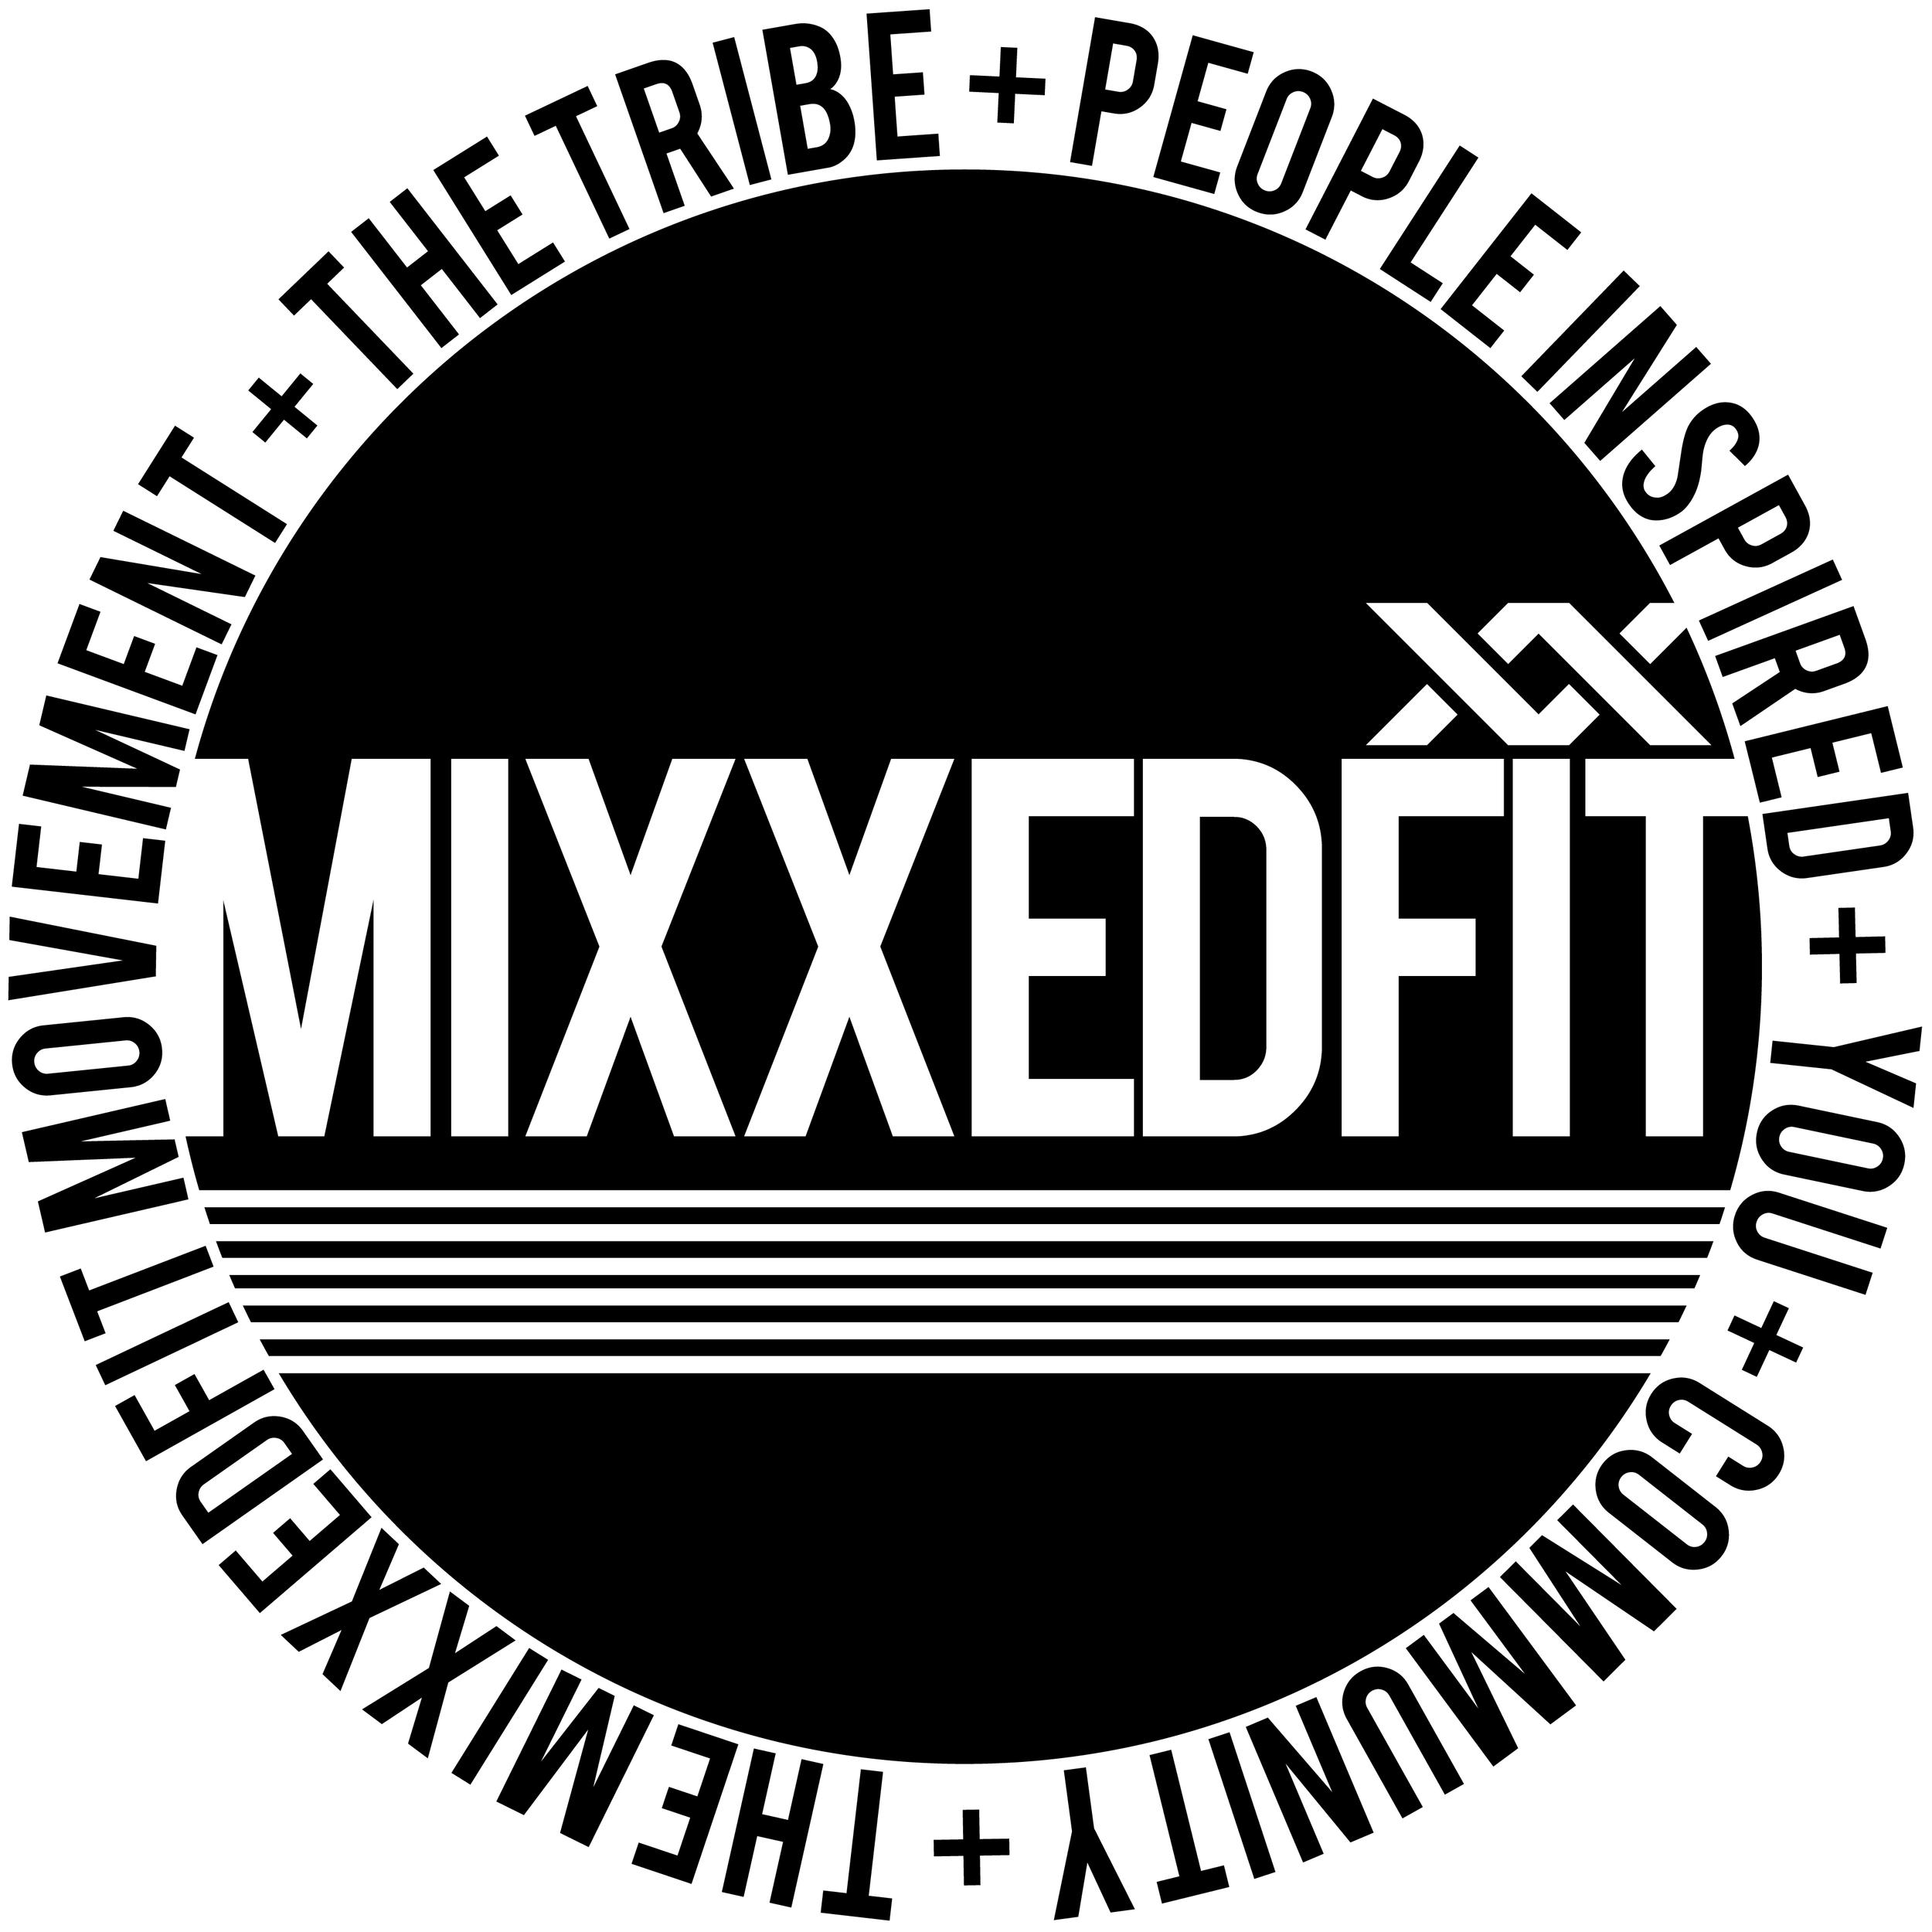 DESIGN03_MIXXEDFITCIRCLE.png